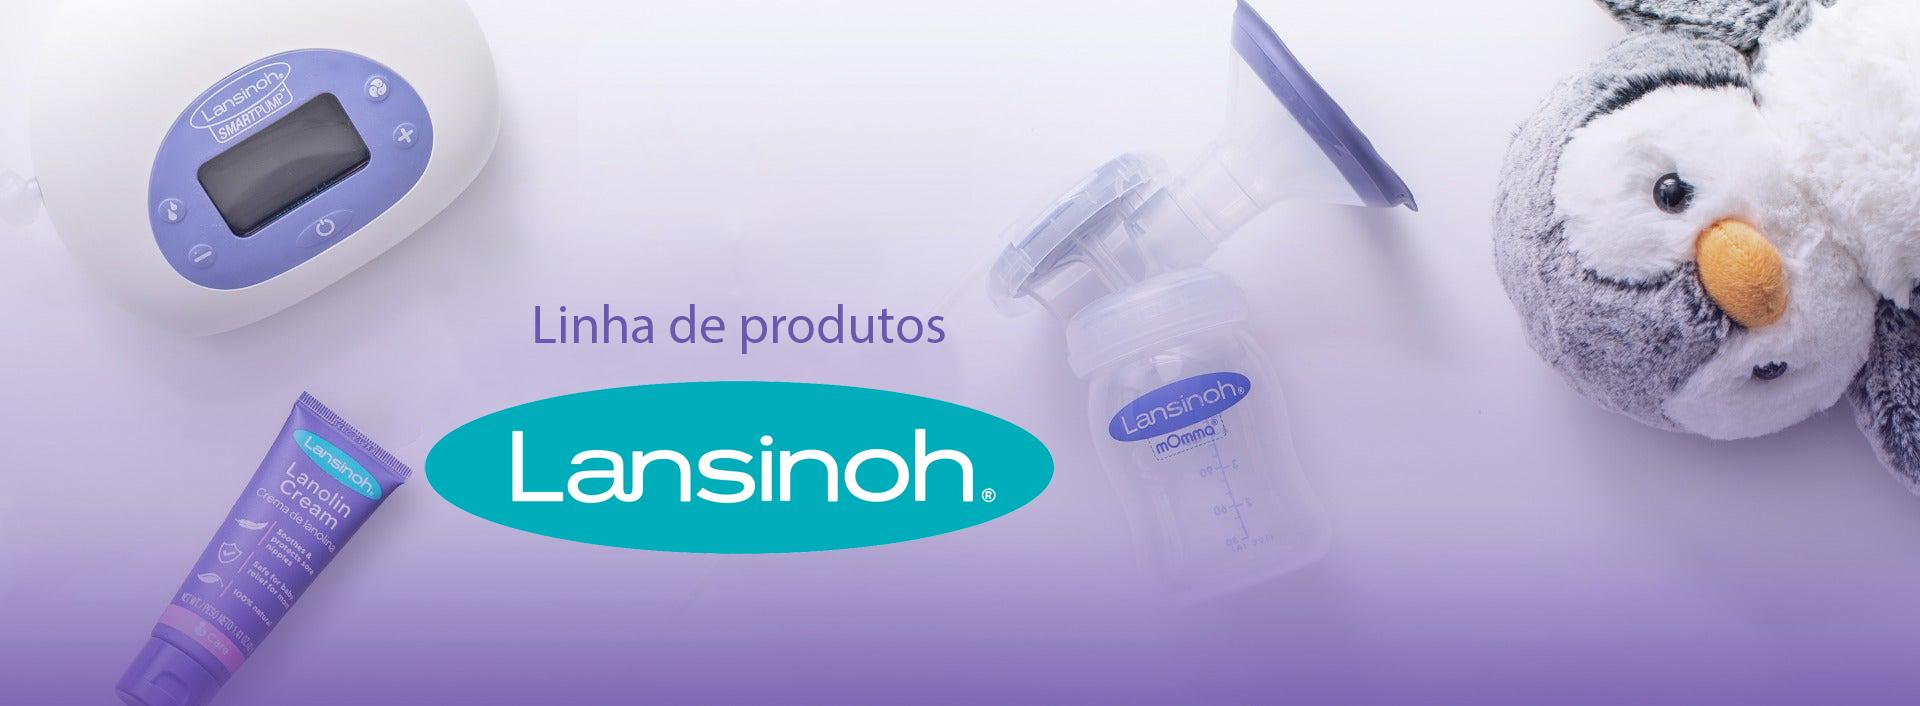 Lansinoh-produtos-Supermamãe